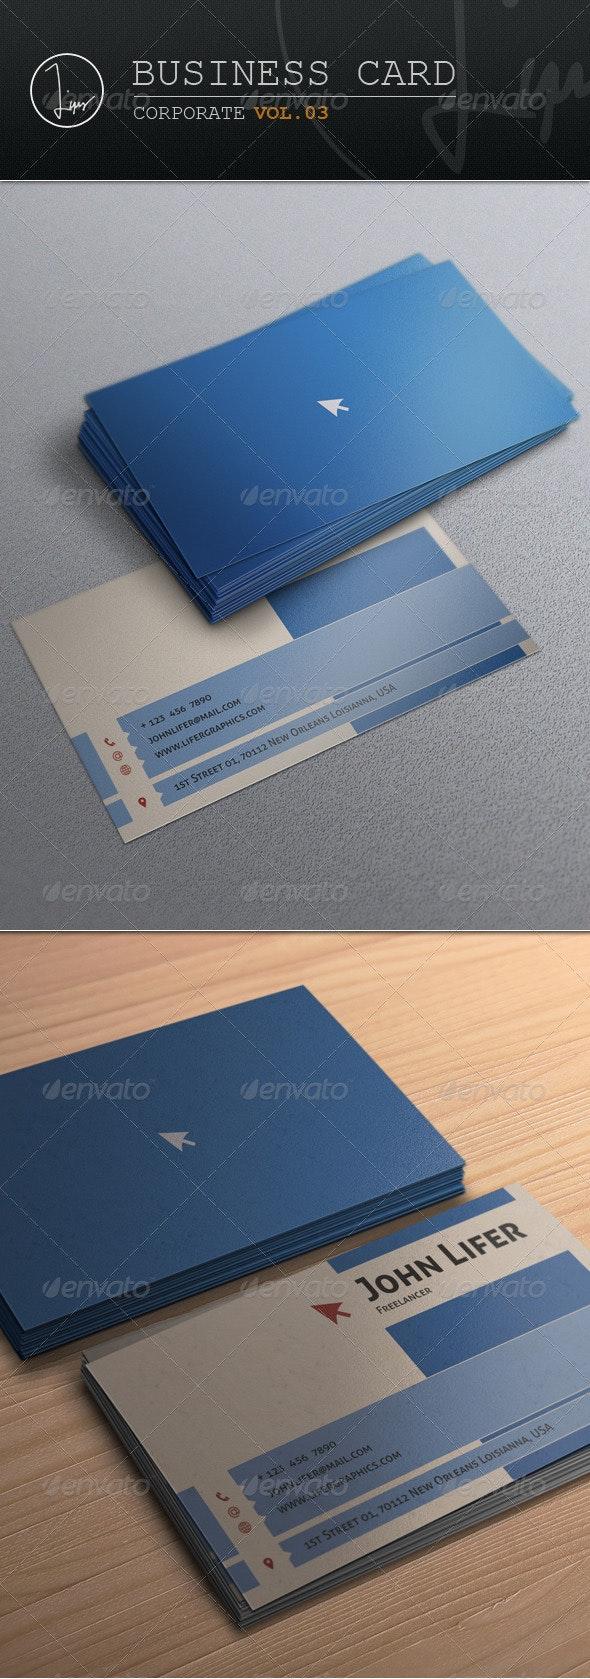 Business Card / Corporate Vol.03 - Corporate Business Cards